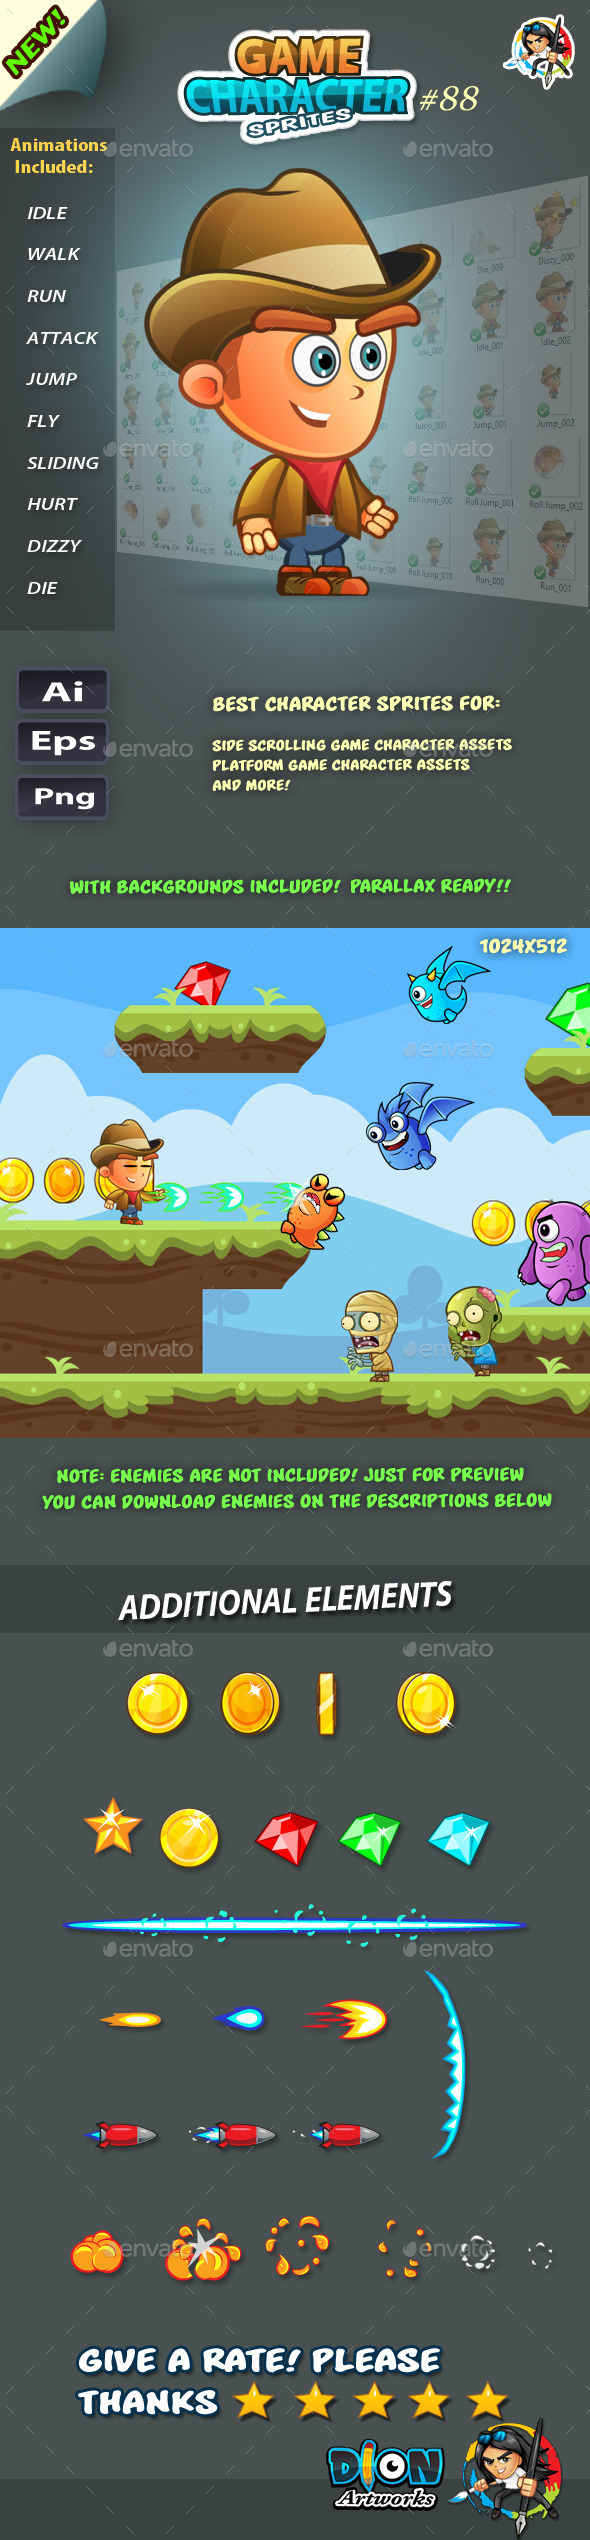 CowBoy 2D Game Character Sprites 88 (Sprites)